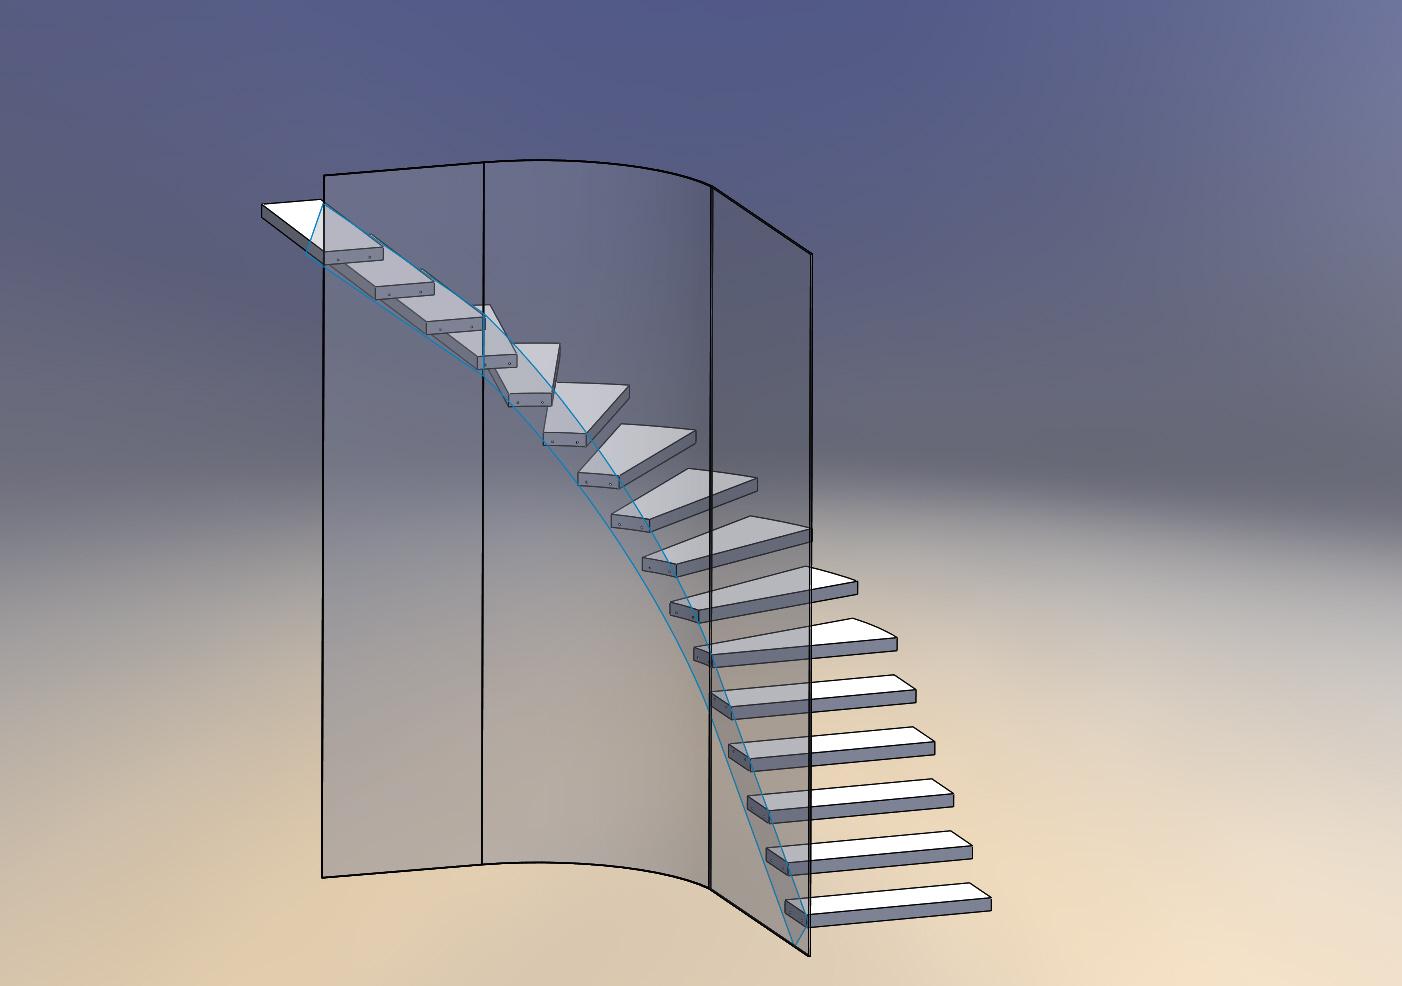 treppe mit radius ds solidworks solidworks l sung vorhanden foren auf. Black Bedroom Furniture Sets. Home Design Ideas